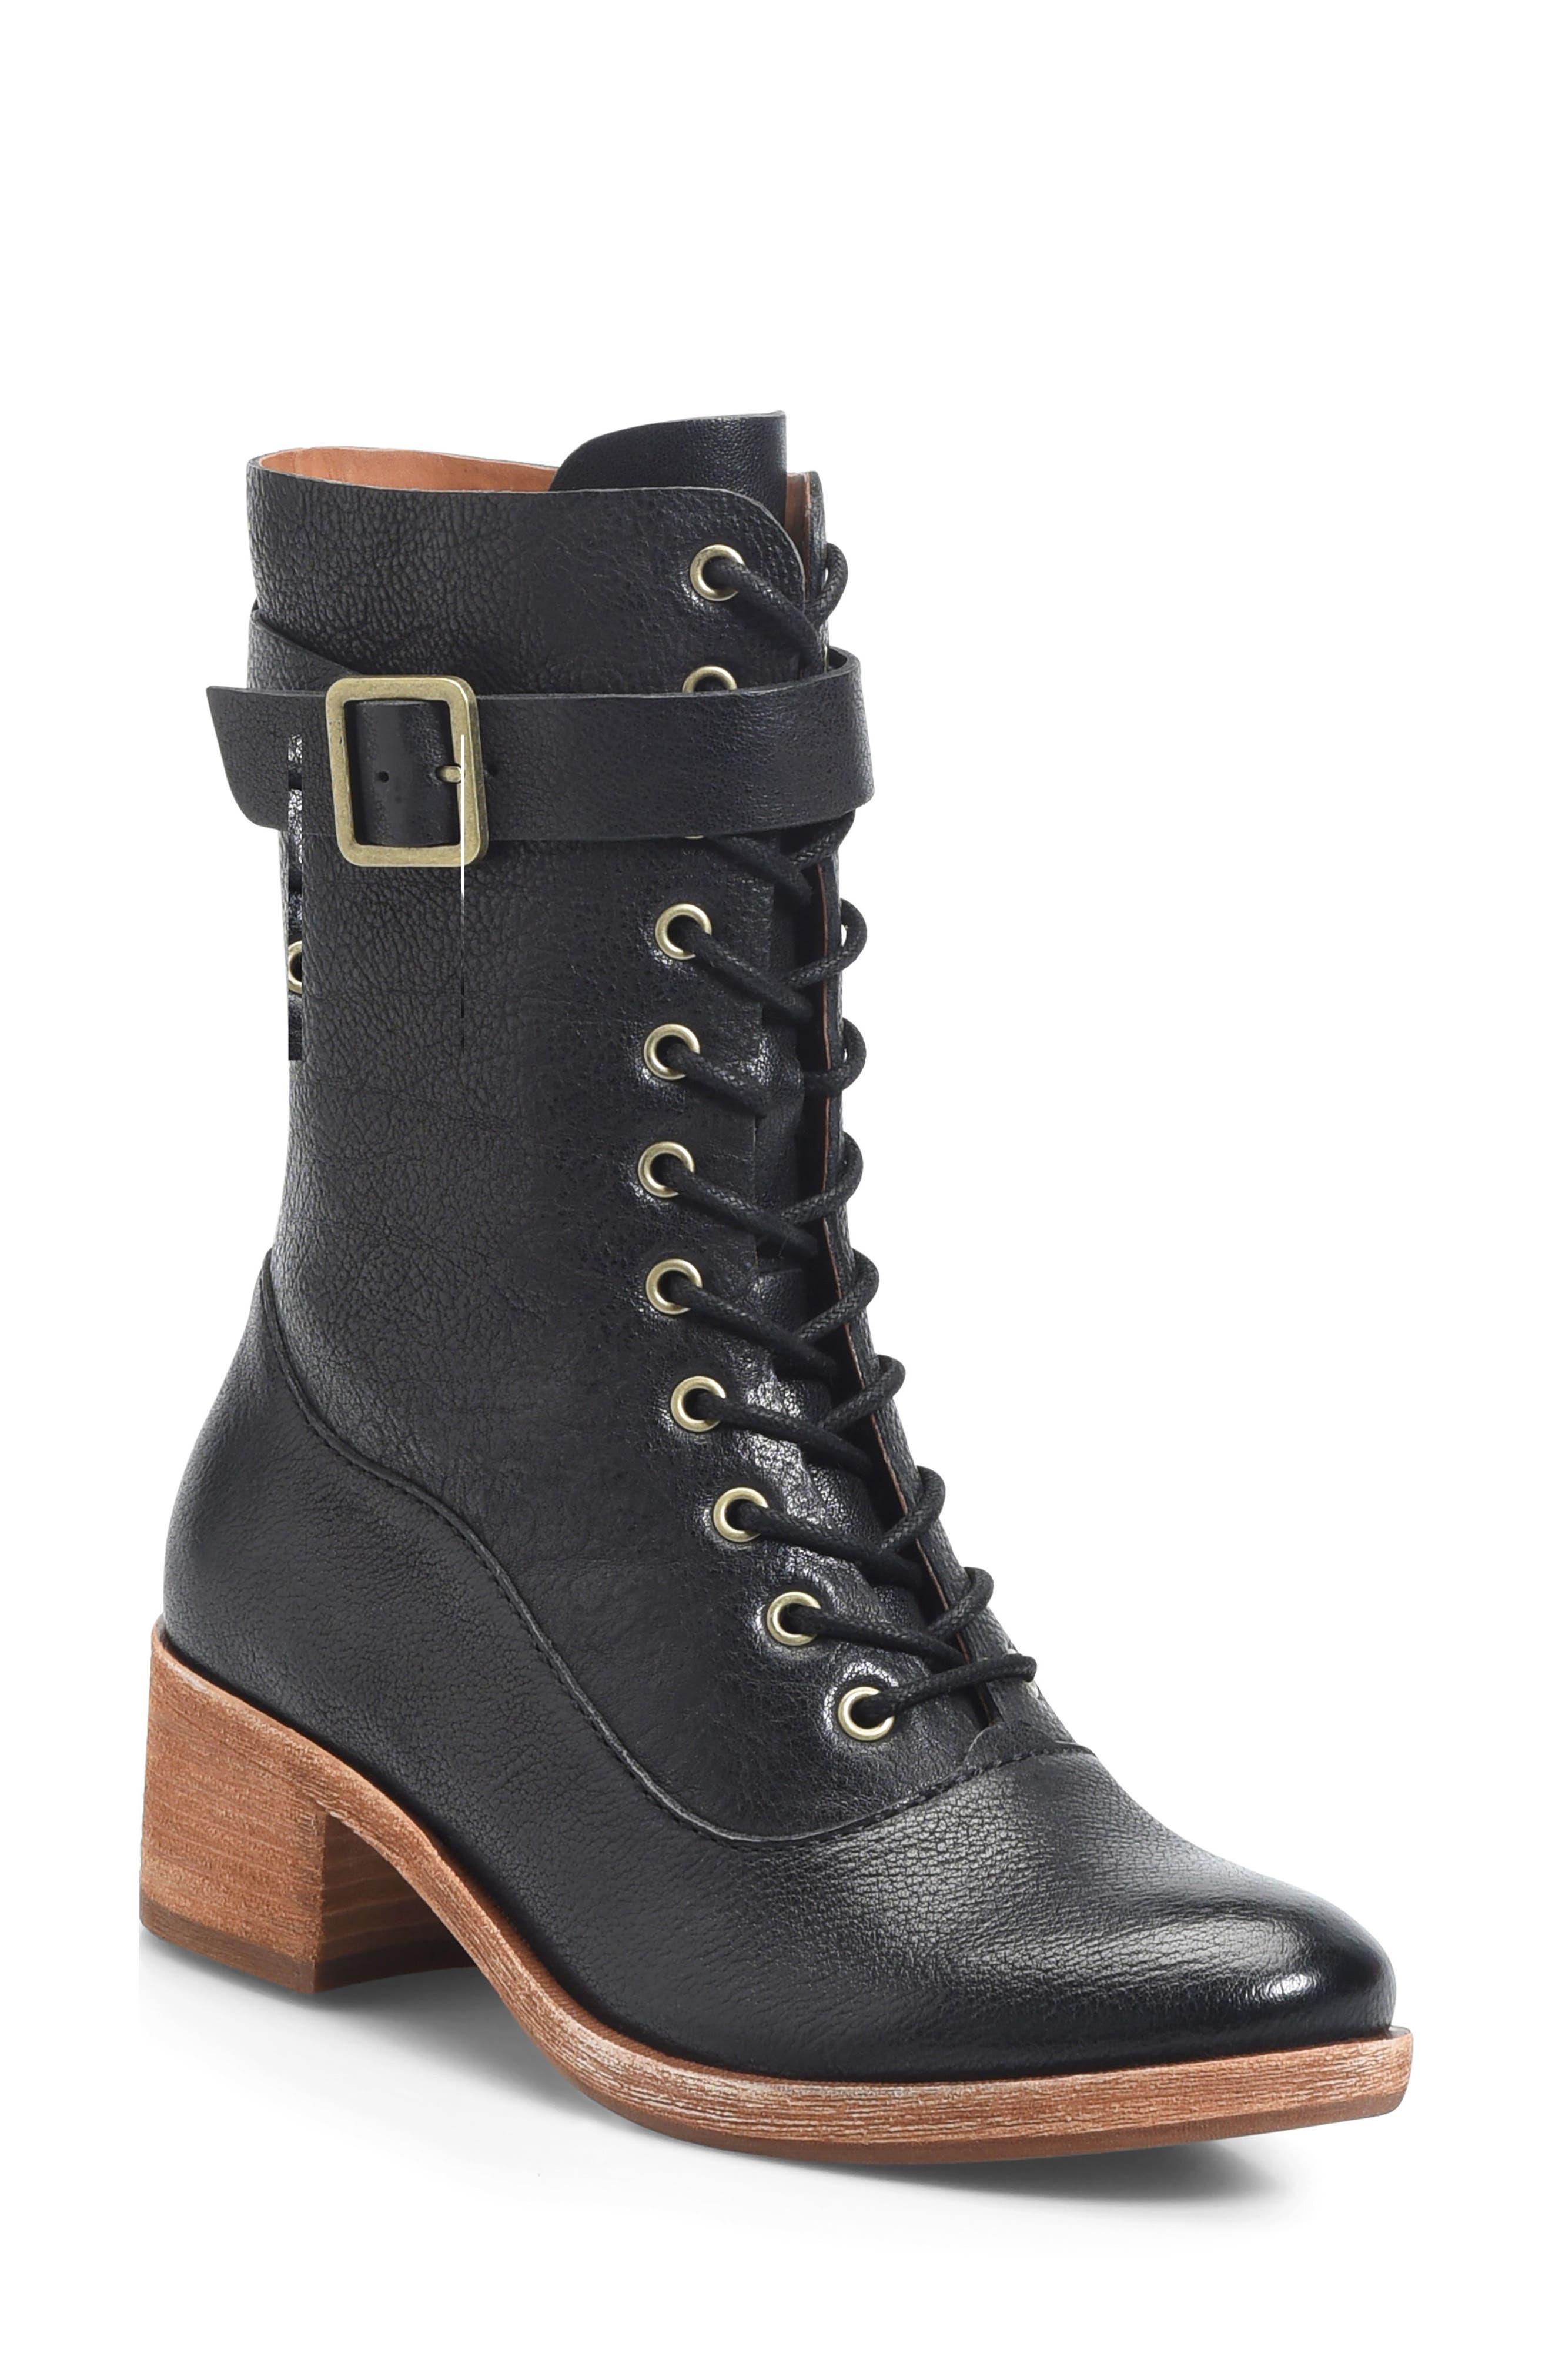 Alternate Image 1 Selected - Kork-Ease® Mona Lace-Up Boot (Women)